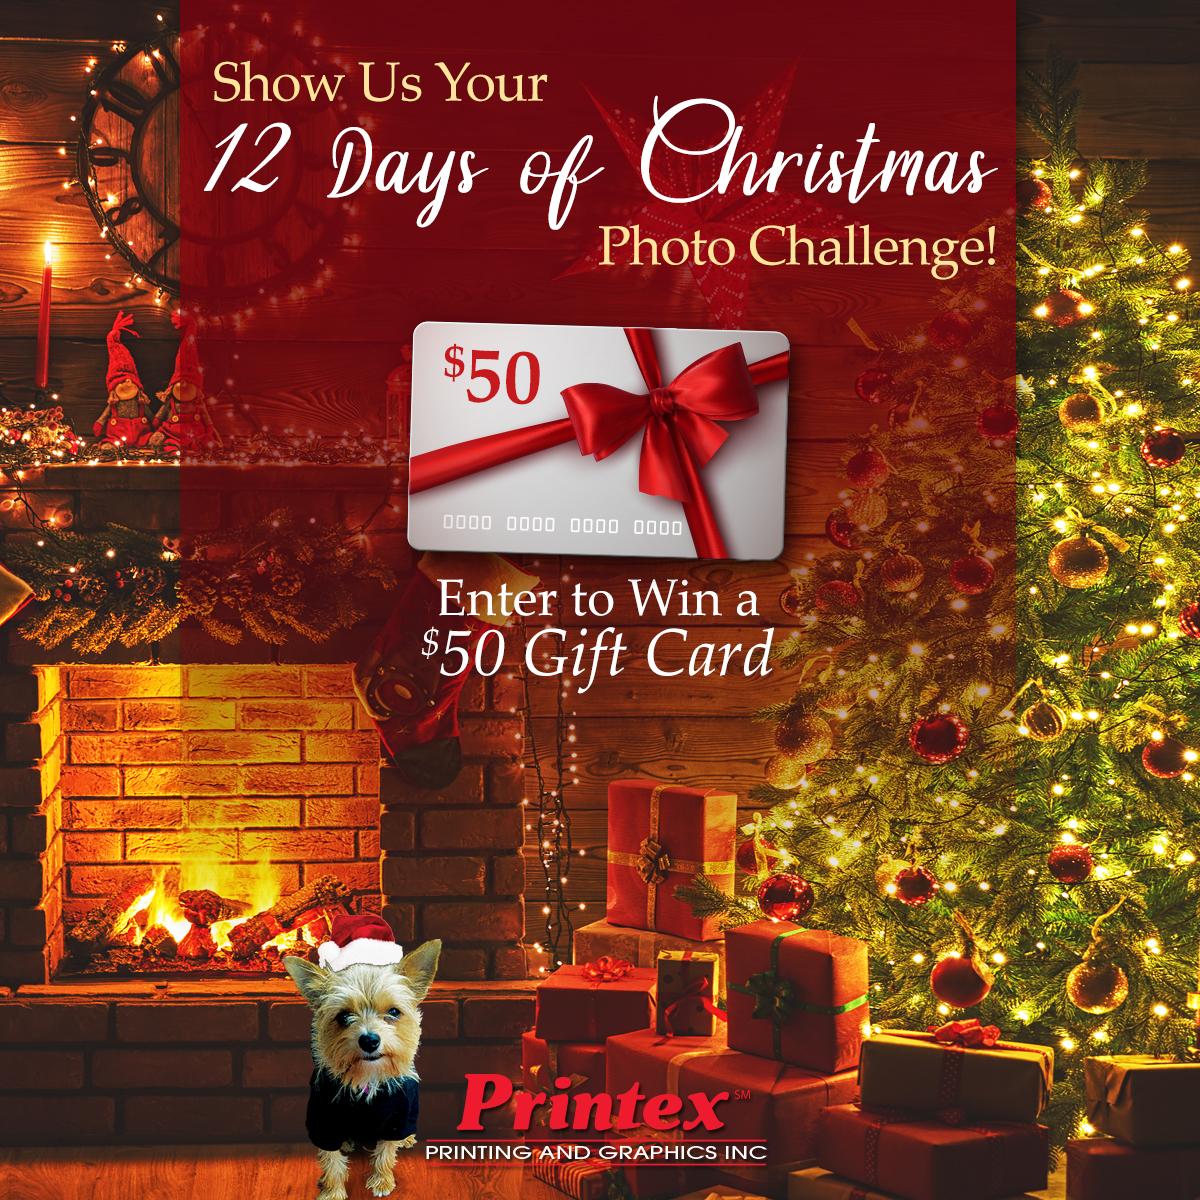 12 Days of Christmas Photo Challenge